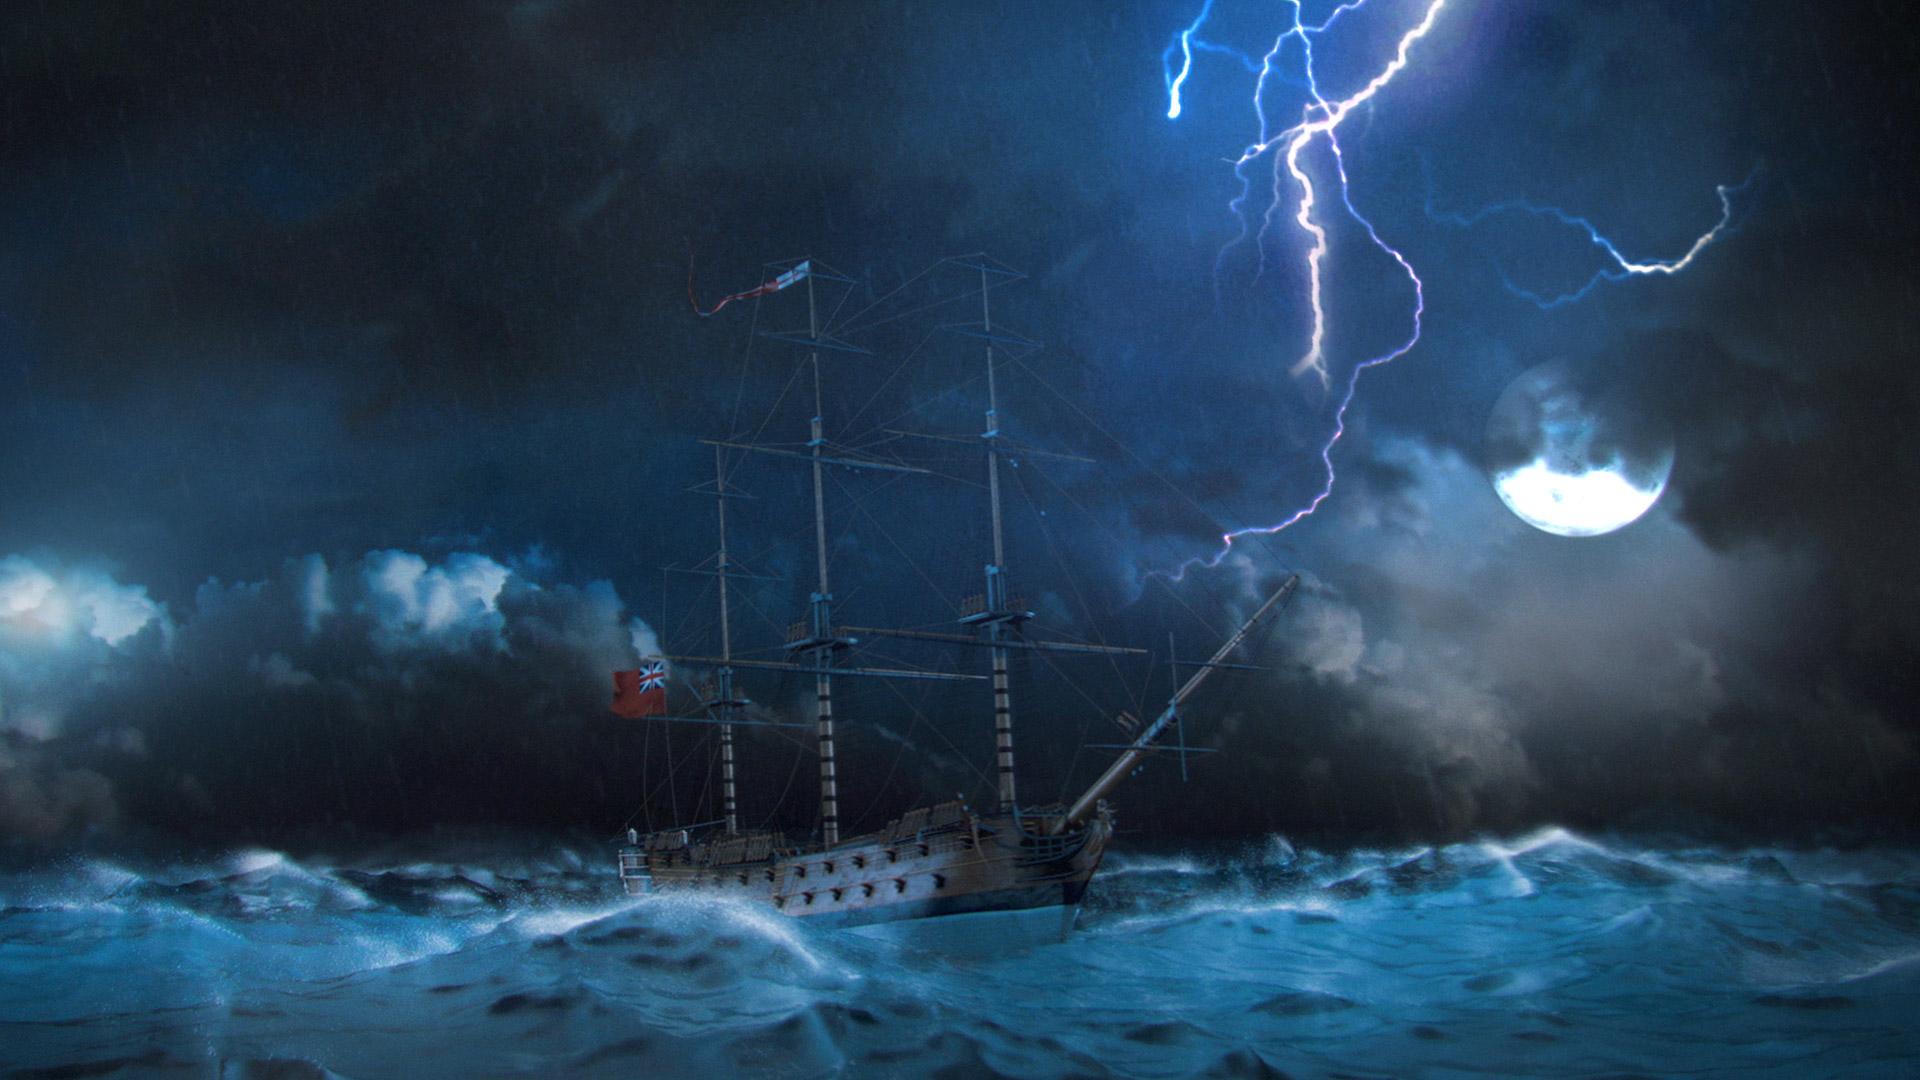 National Maritime Museum | Ships Clocks Stars